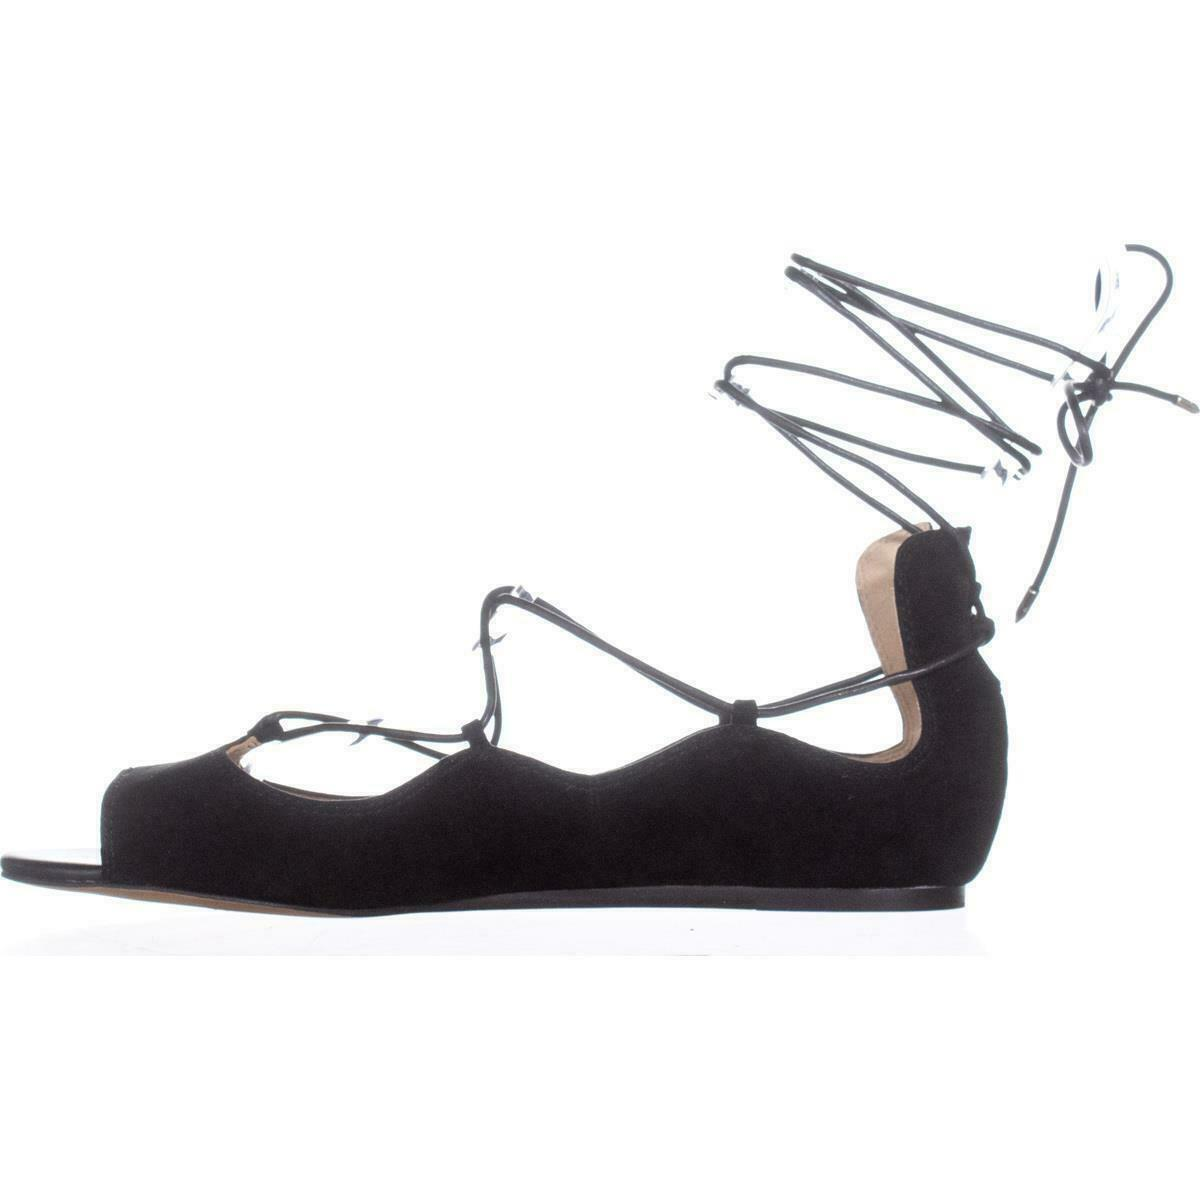 Sam Edelman Barbara Lace Up Ballet Flats , Black Suede